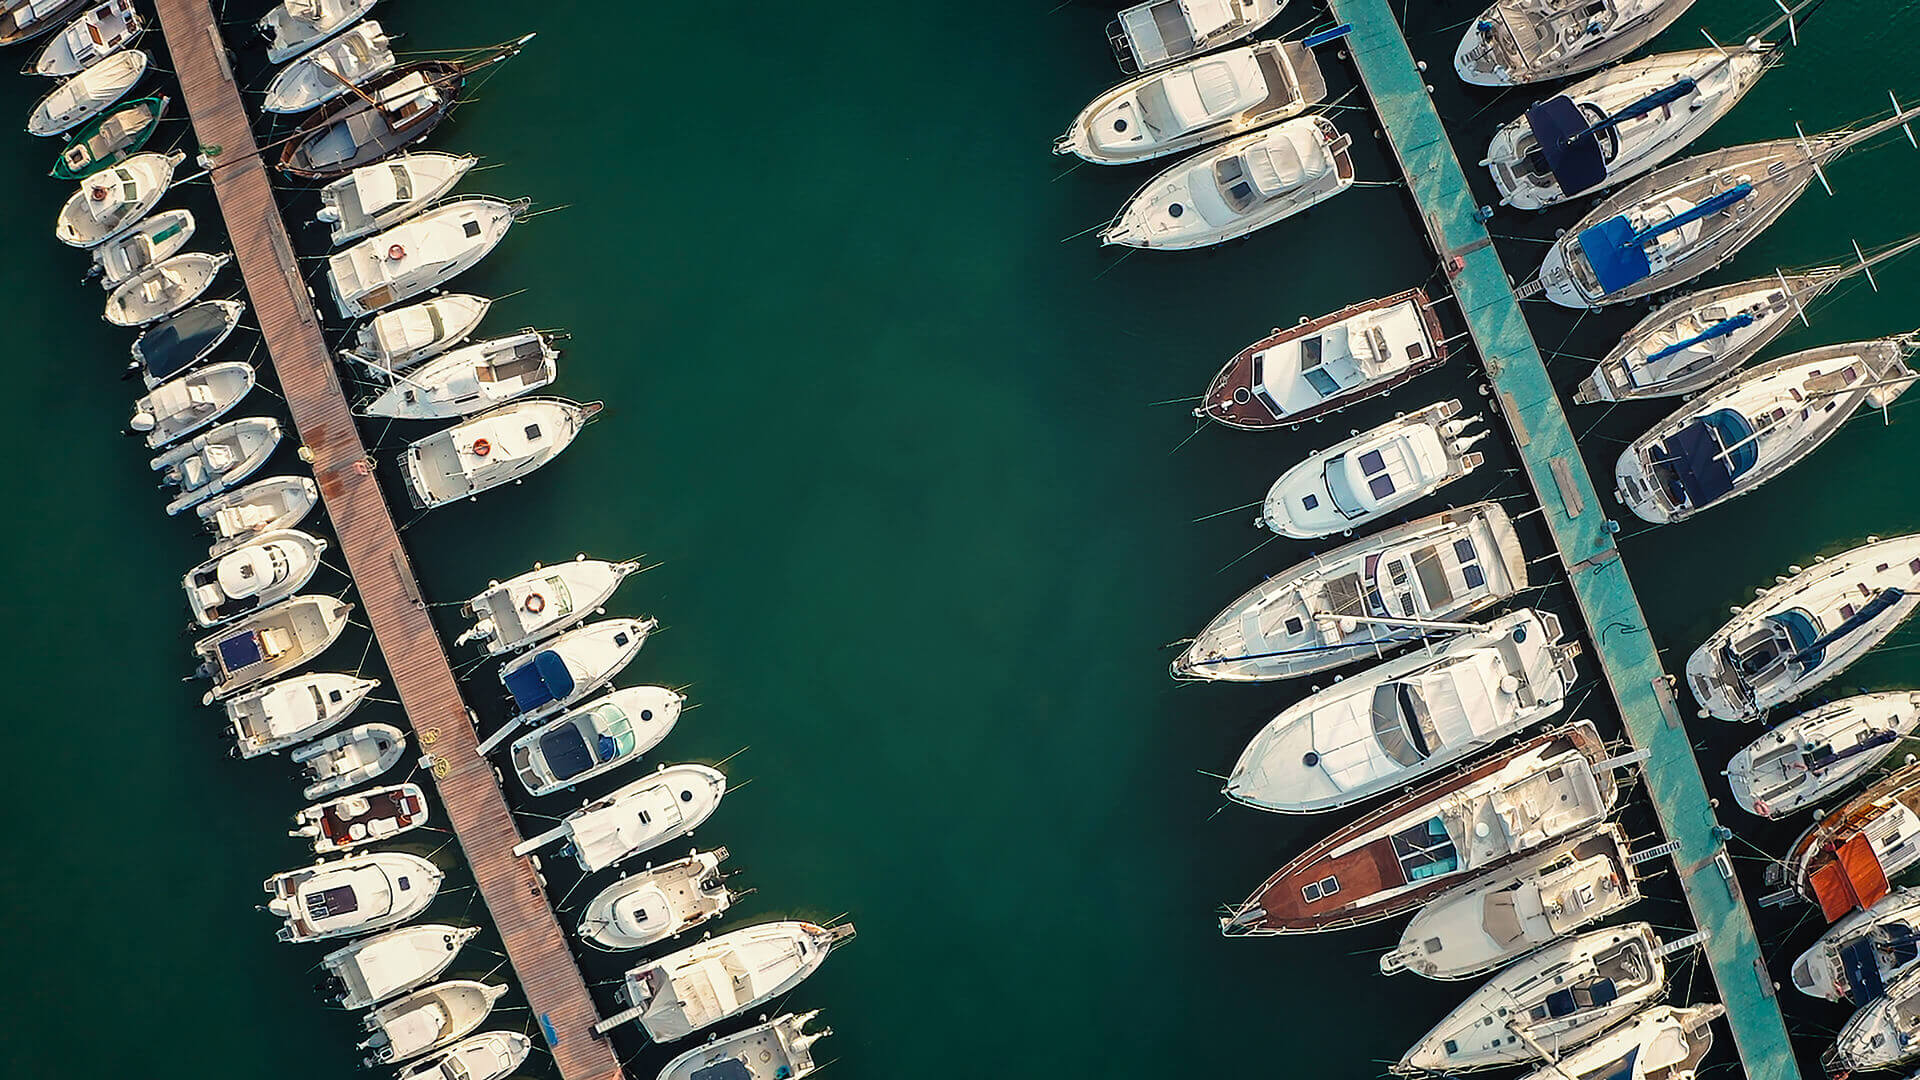 Marina di porto torres